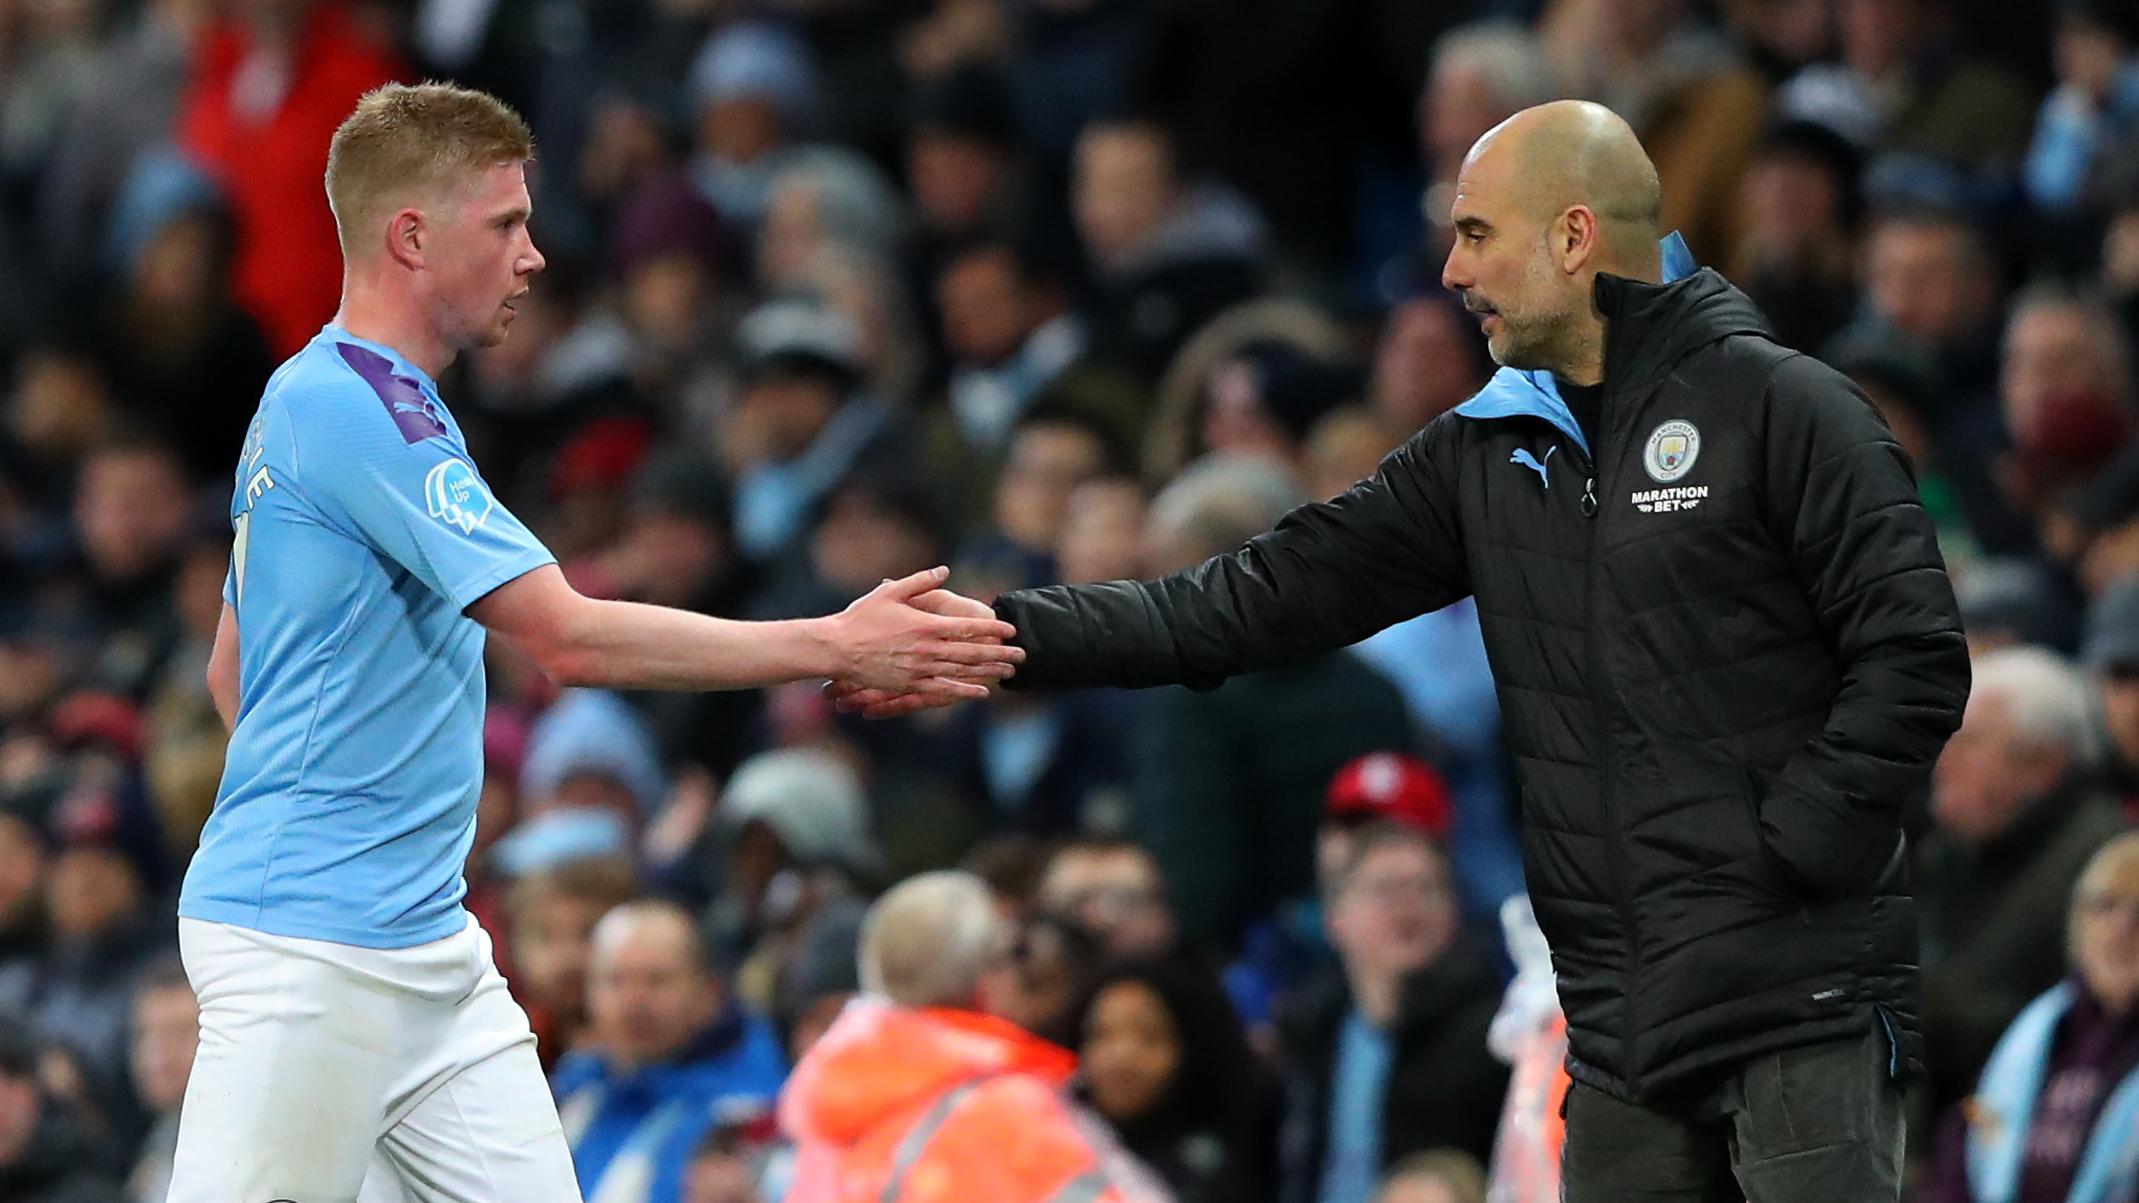 Kevin De Bruyne/Pep Guardiola Manchester City 2019-20